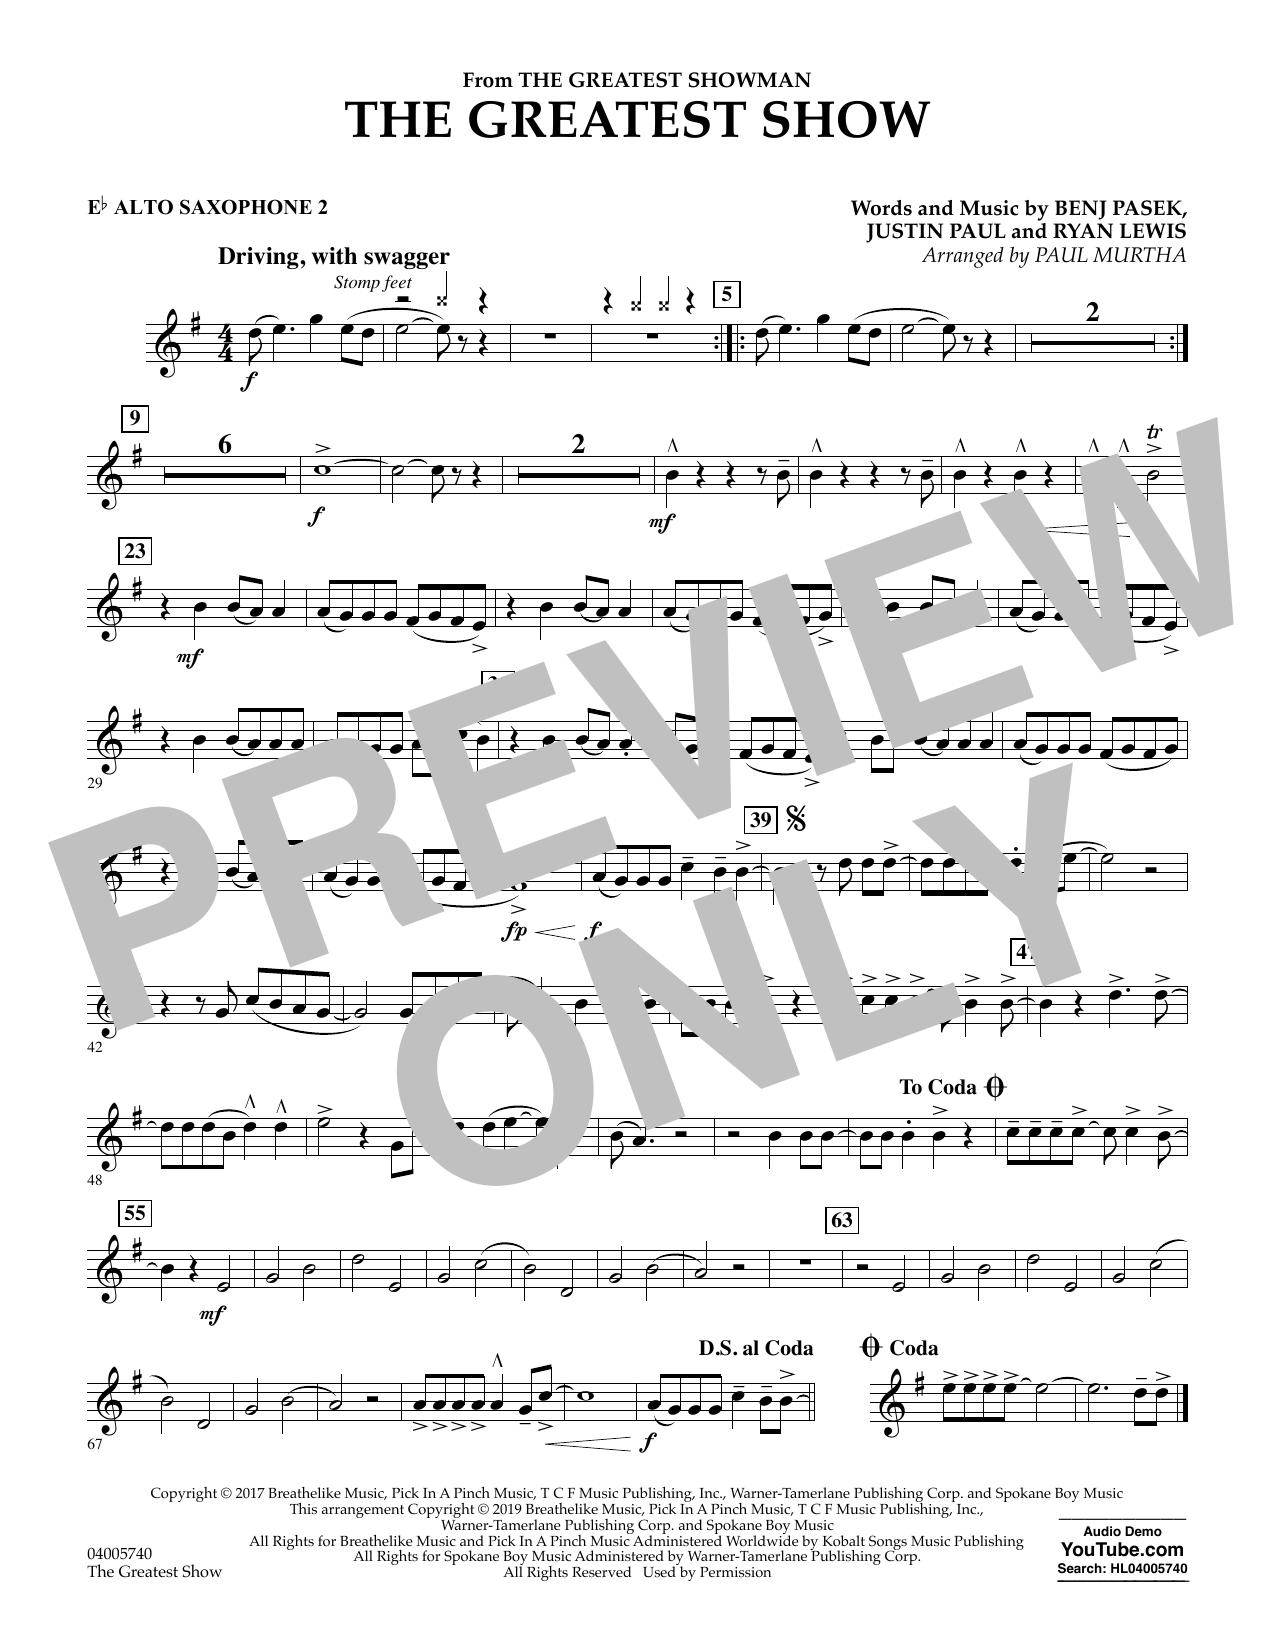 The Greatest Show  (arr. Paul Murtha) - Eb Alto Saxophone 2 (Concert Band)